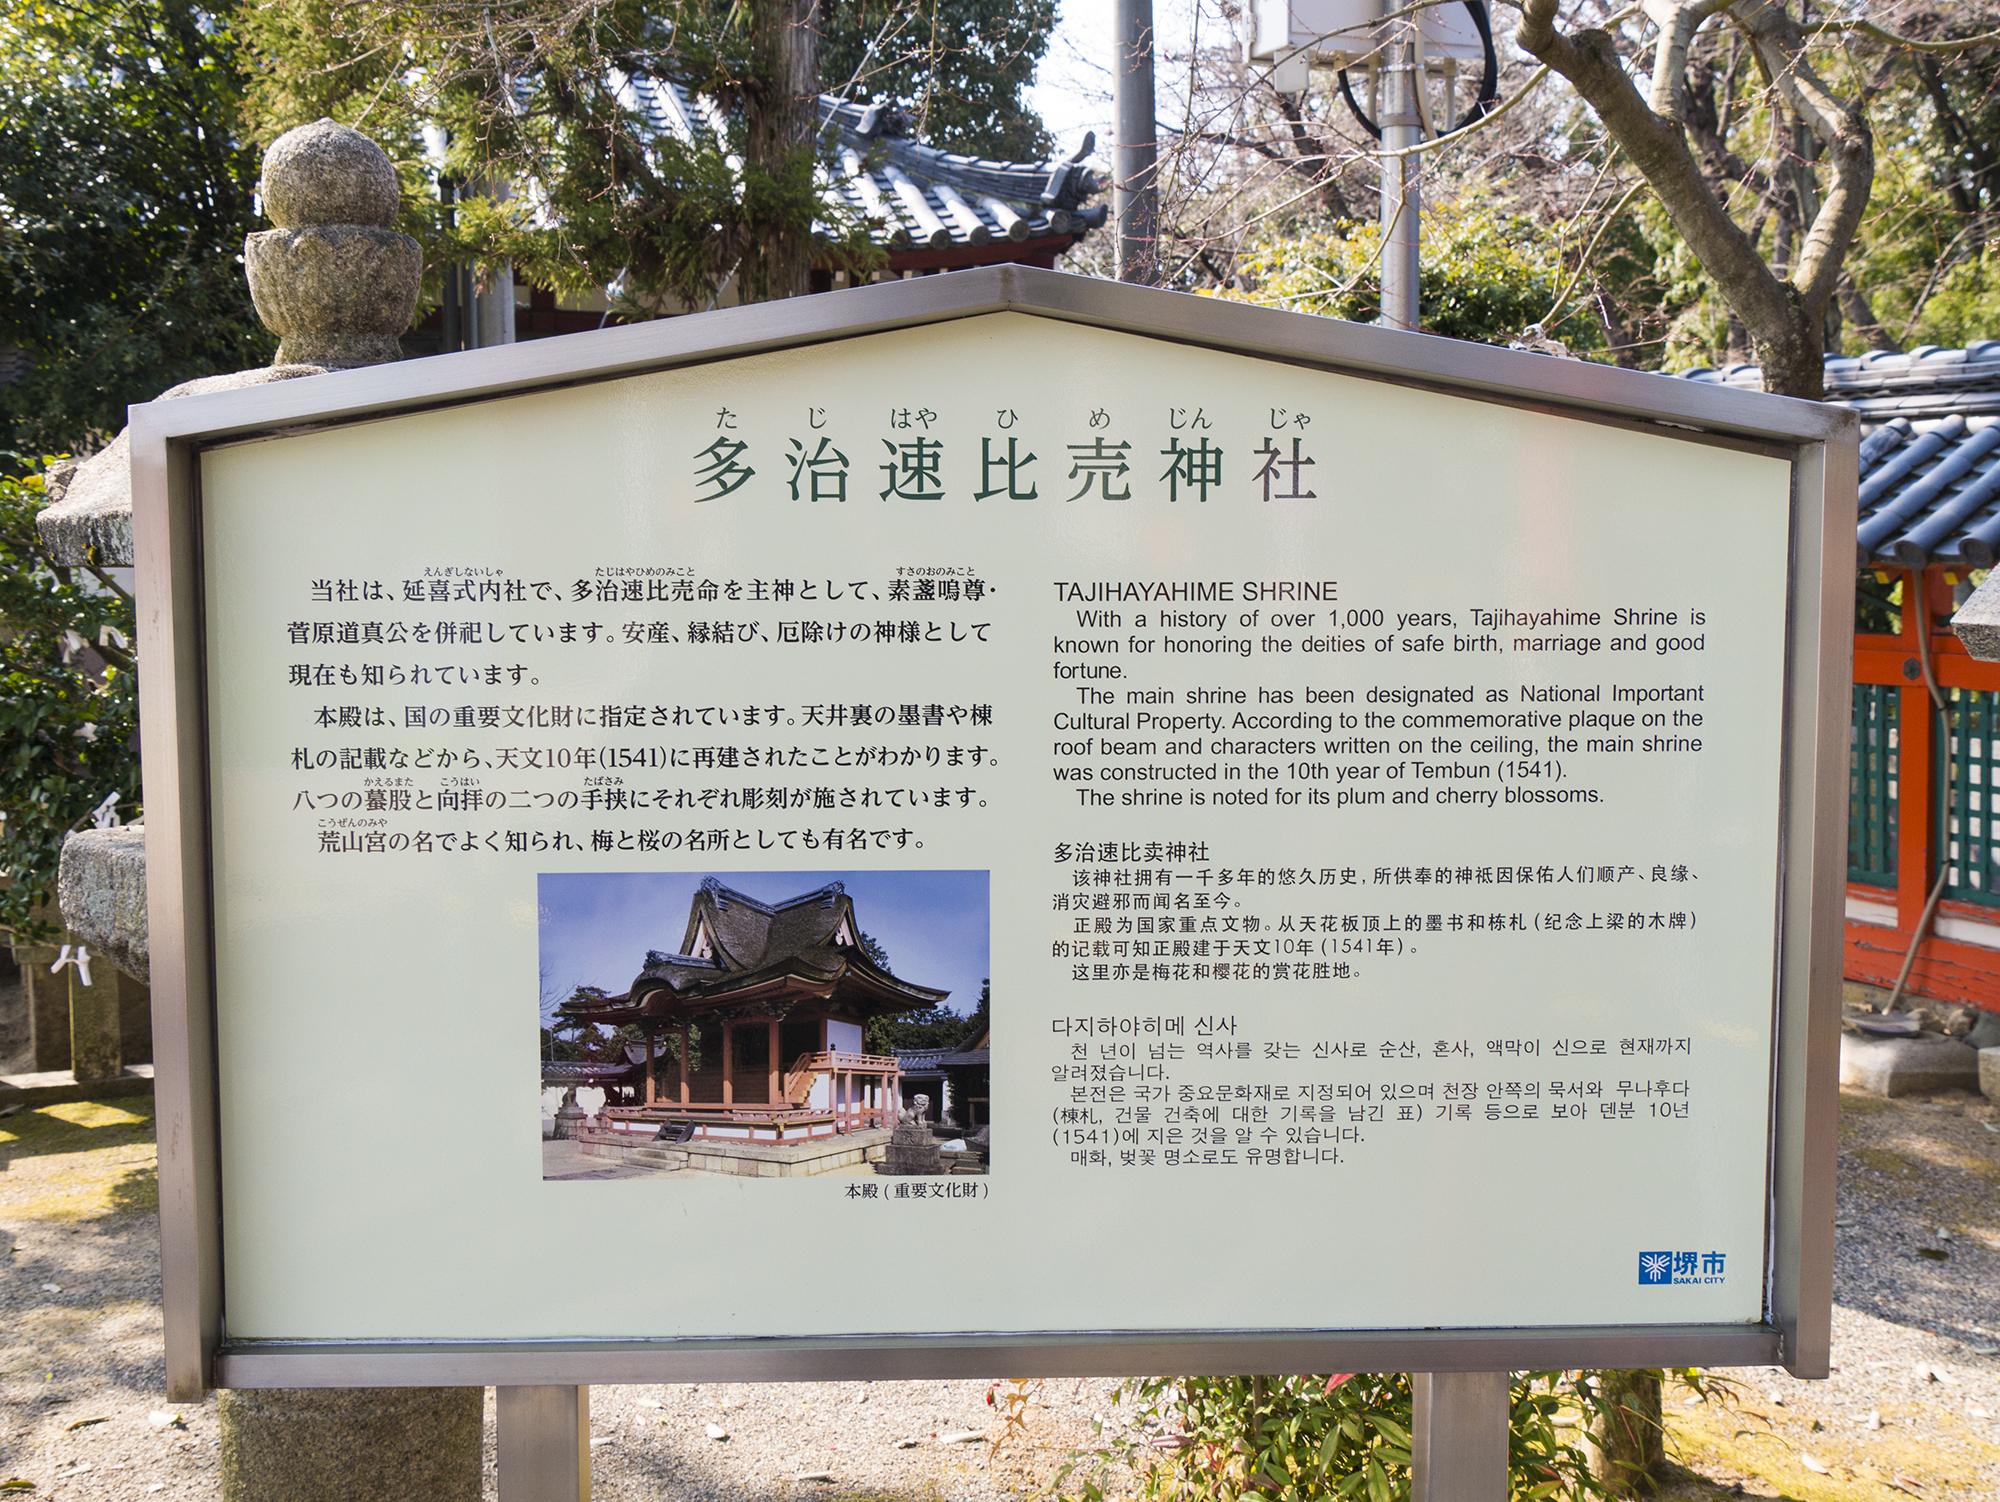 tajihayahimejinnjya-03.jpg